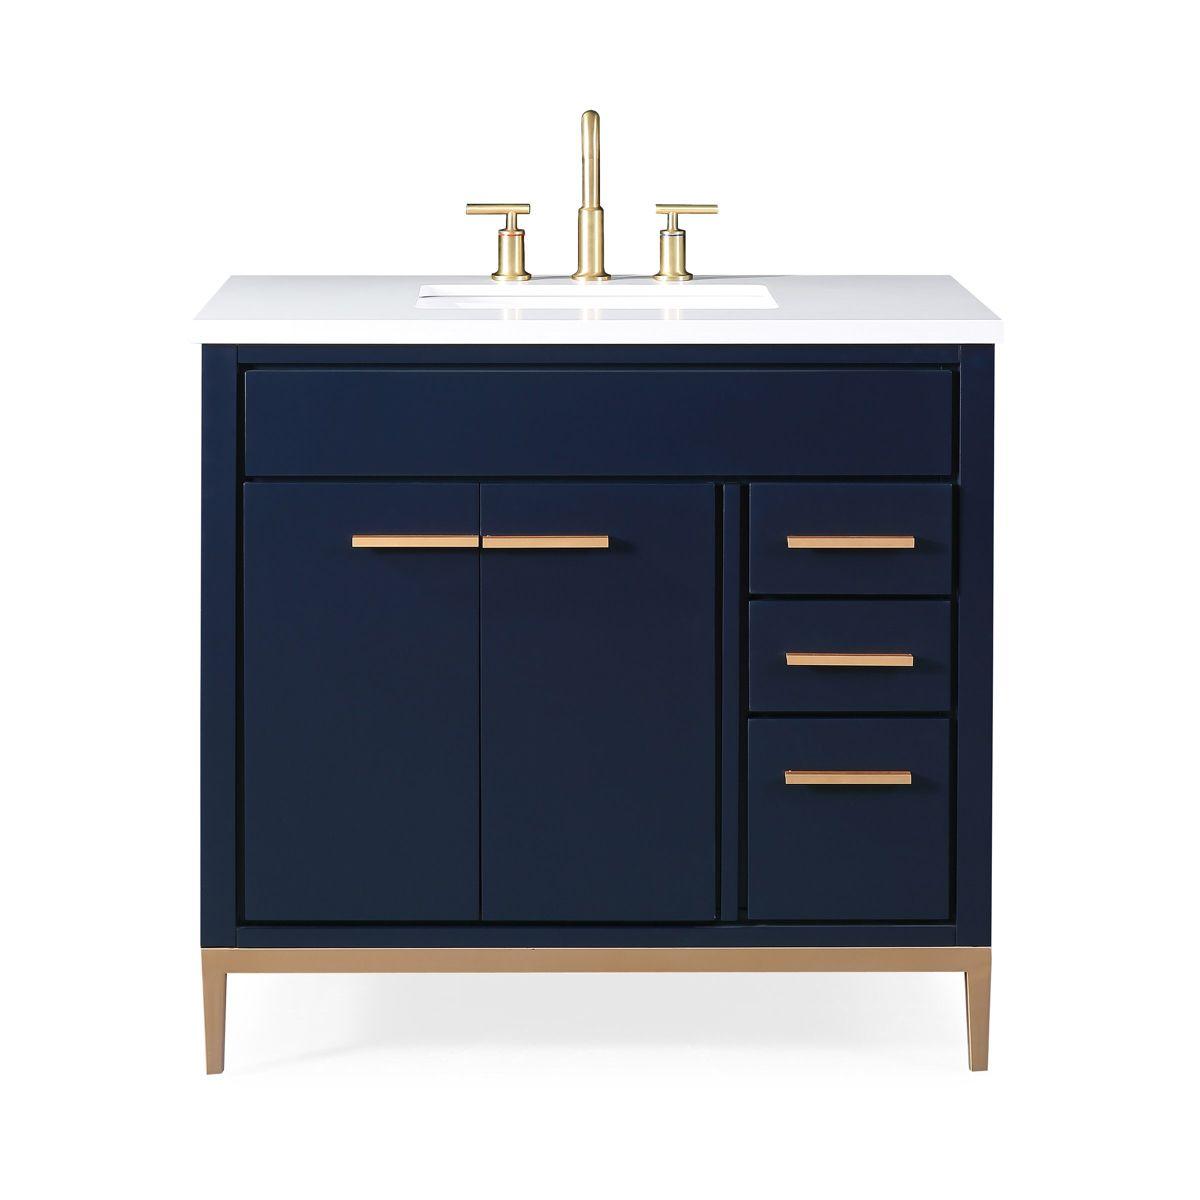 36 Tennant Brand Beatrice Navy Blue Modern Bathroom Sink Vanity Tb 9888nb V36 Modern Bathroom Sink Bathroom Sink Vanity Blue Modern Bathrooms